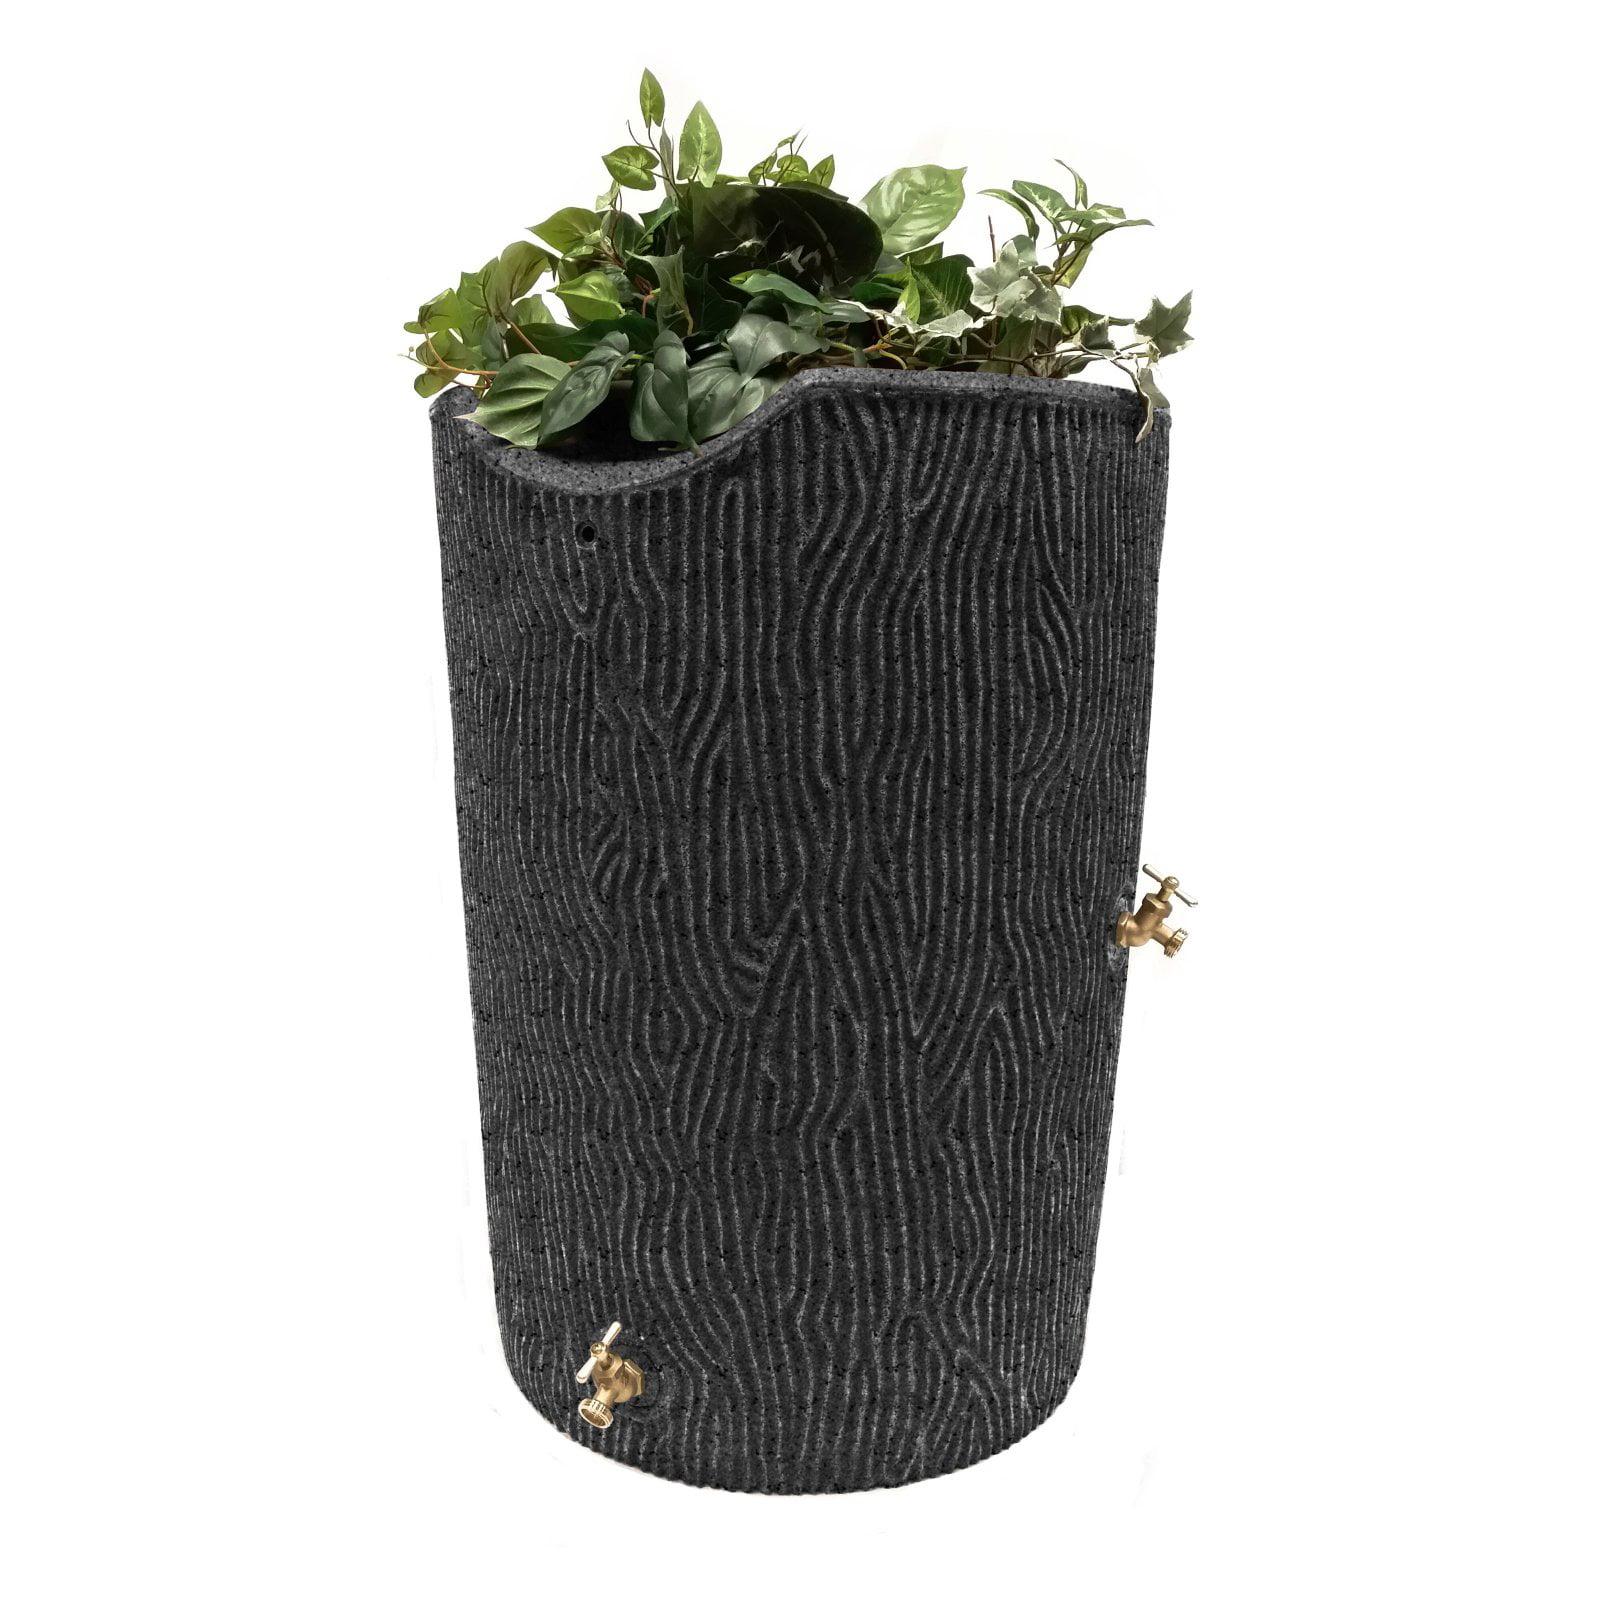 Impressions 50-Gallon Bark Rain Saver, Dark Granite